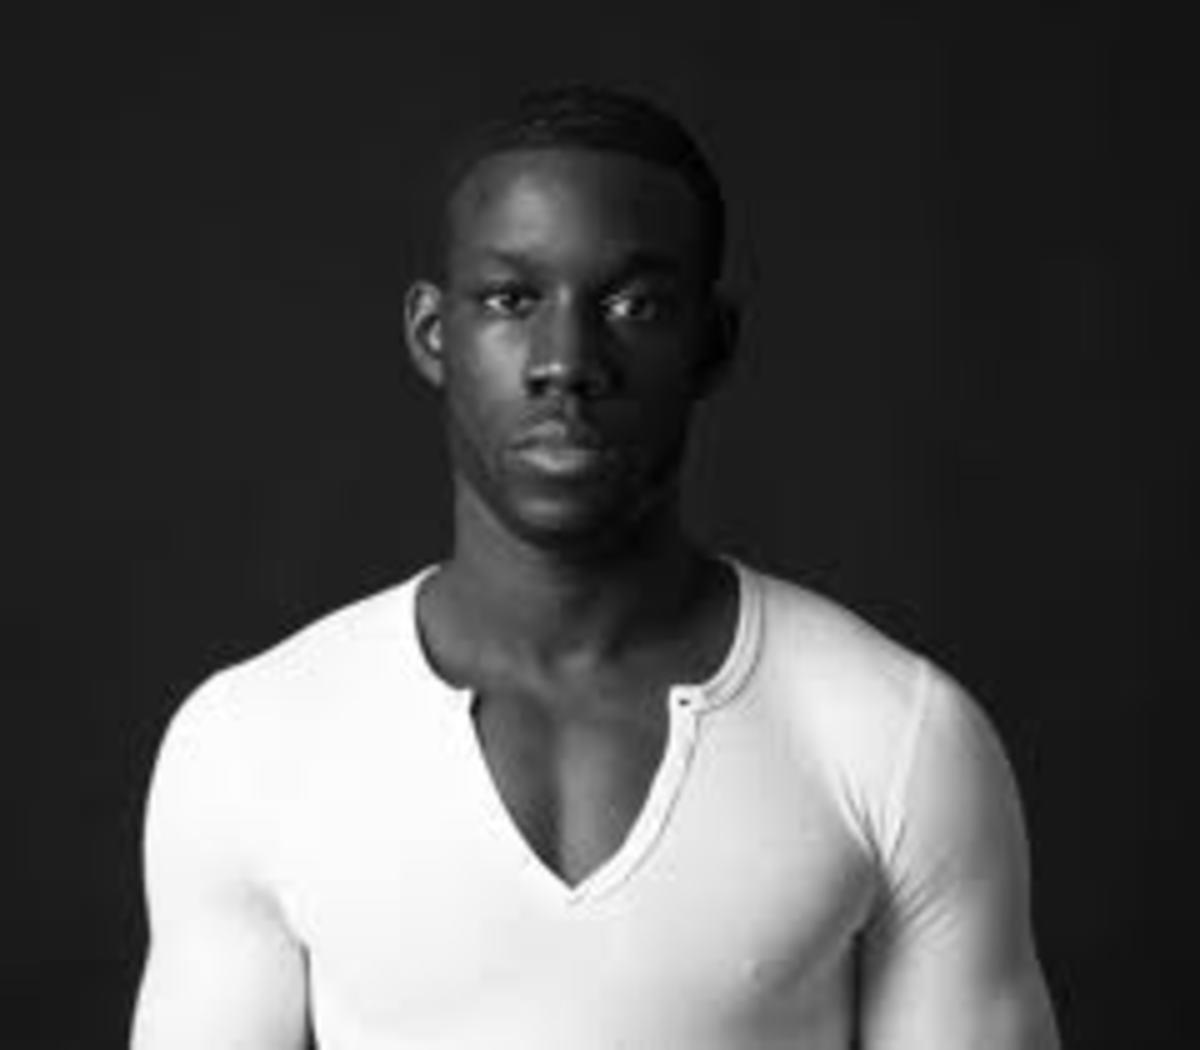 Sociological studies confirm that Blacks & Caucasians in America still perceive dark-skinned Blacks more negatively than they do light-skinned Blacks who are often seen more positively.